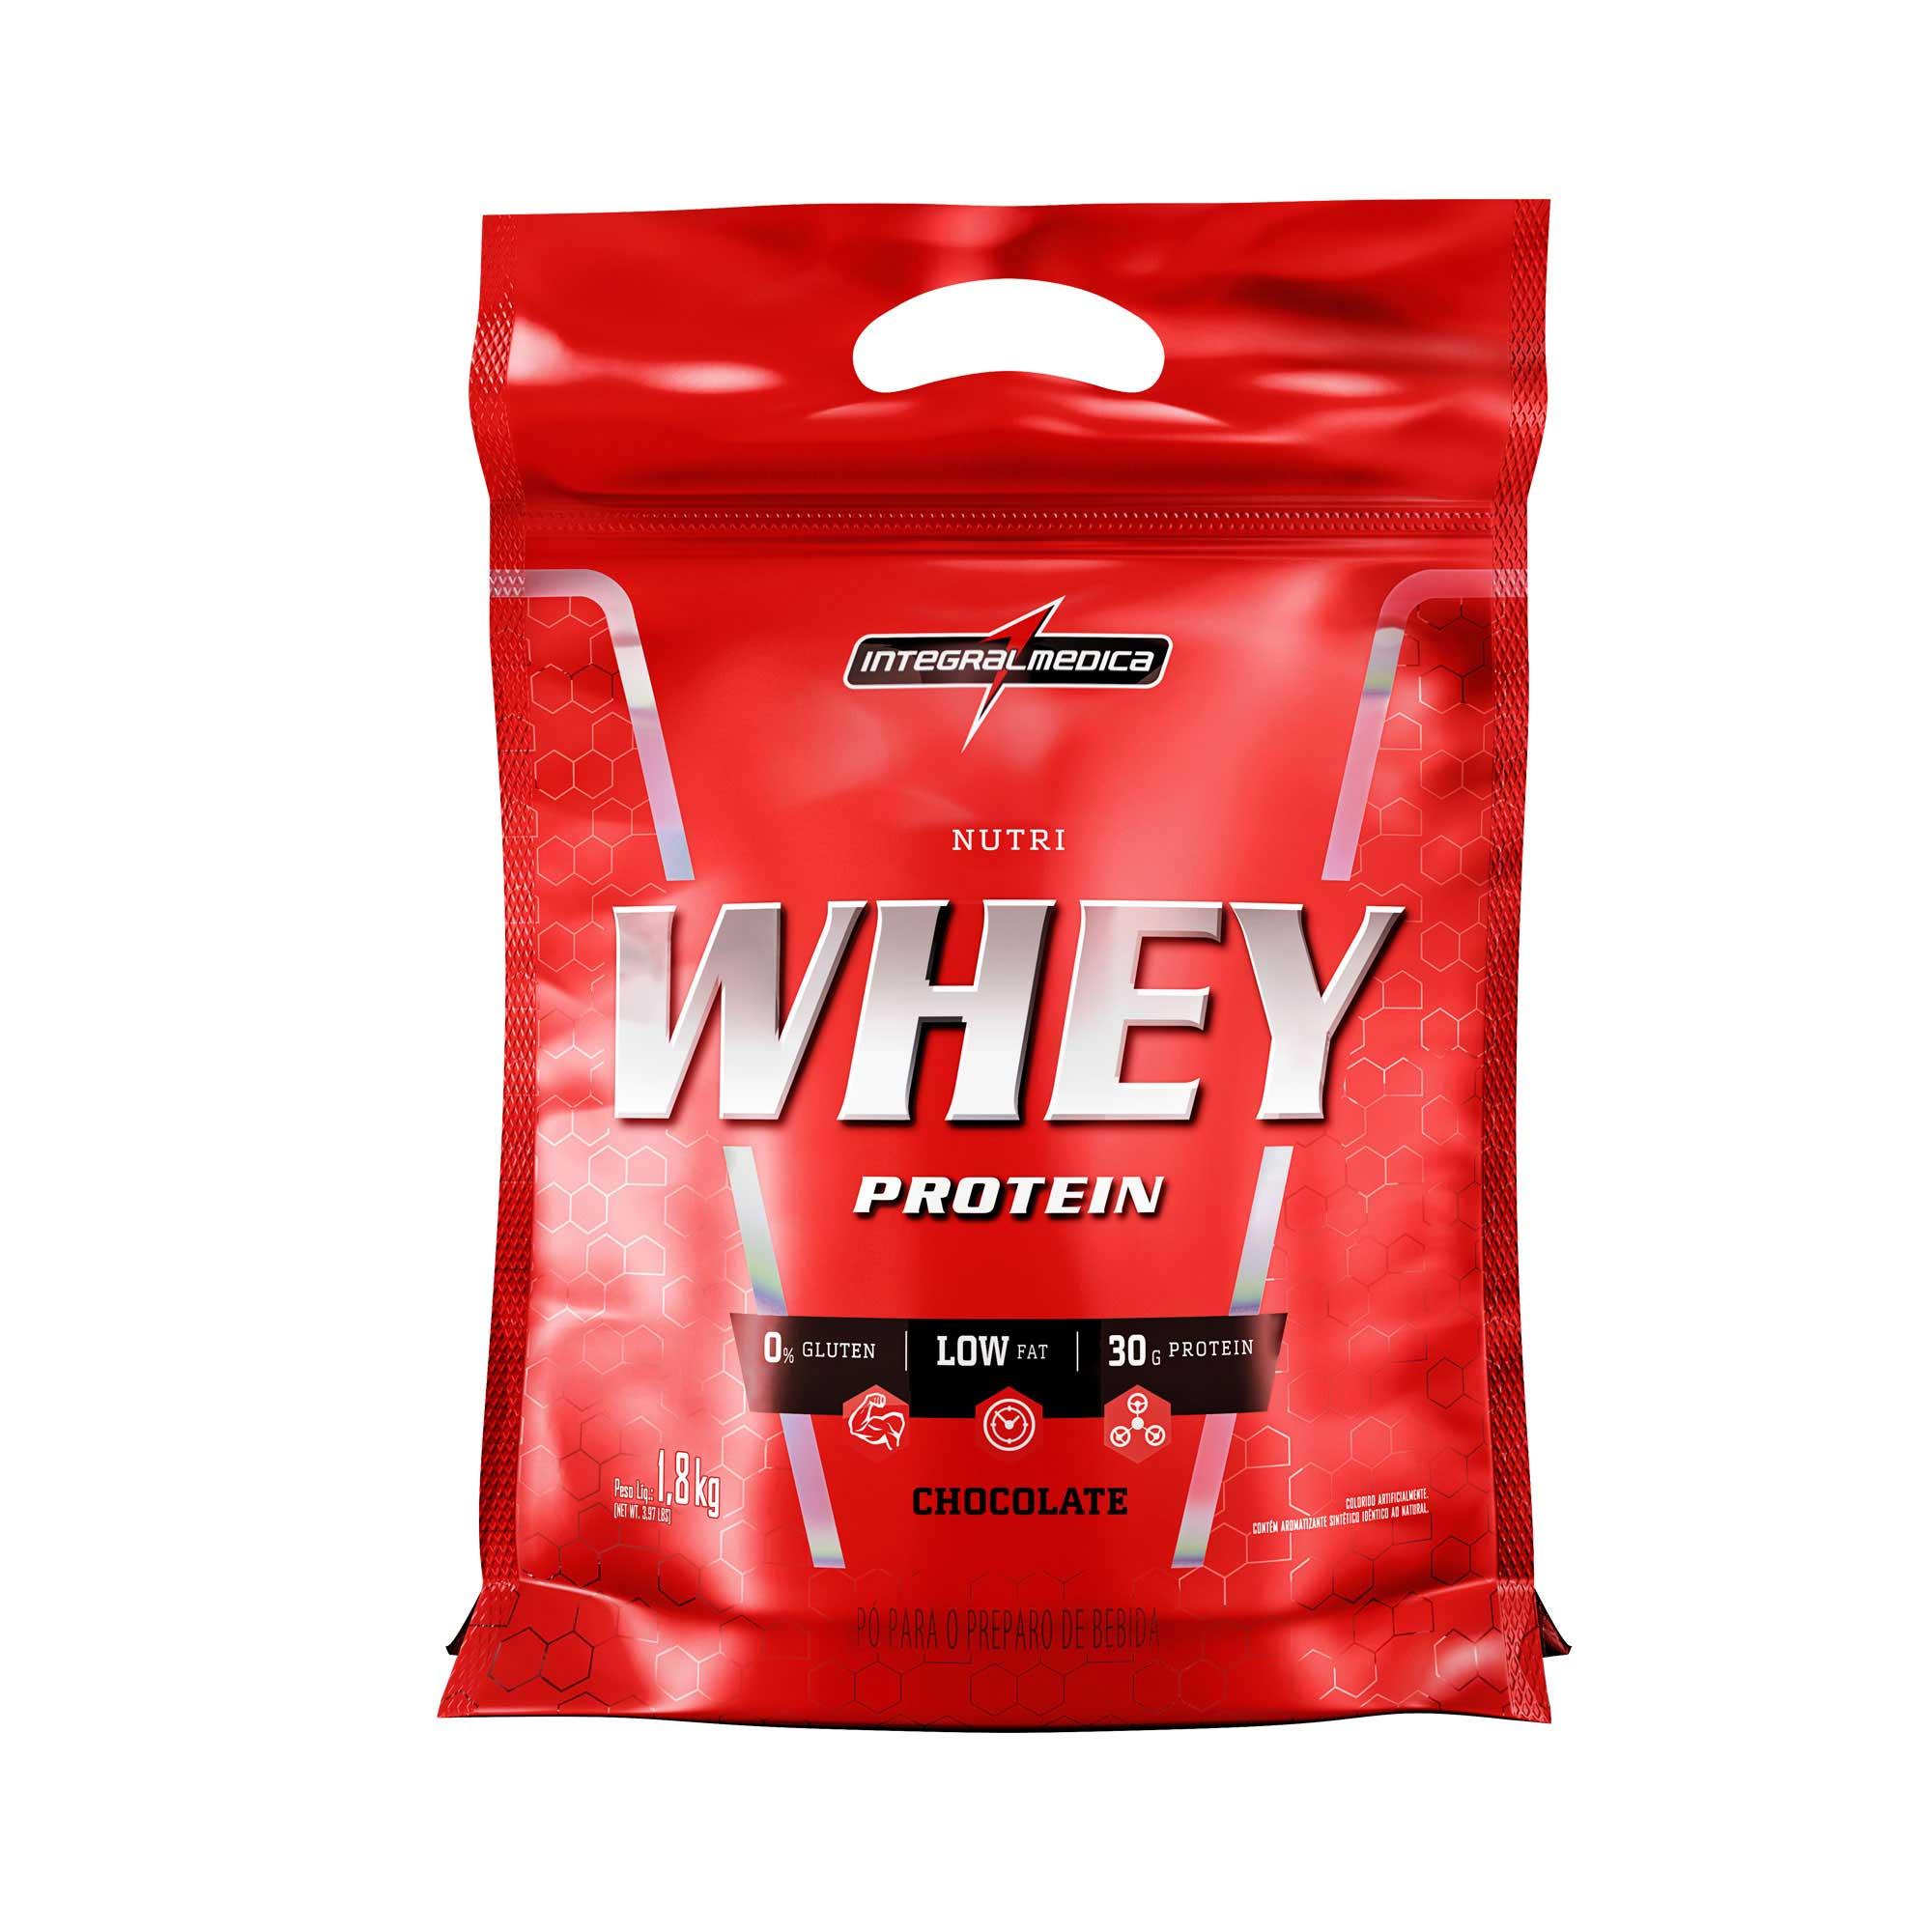 NutriWhey Protein Chocolate 1,8kg Integralmedica